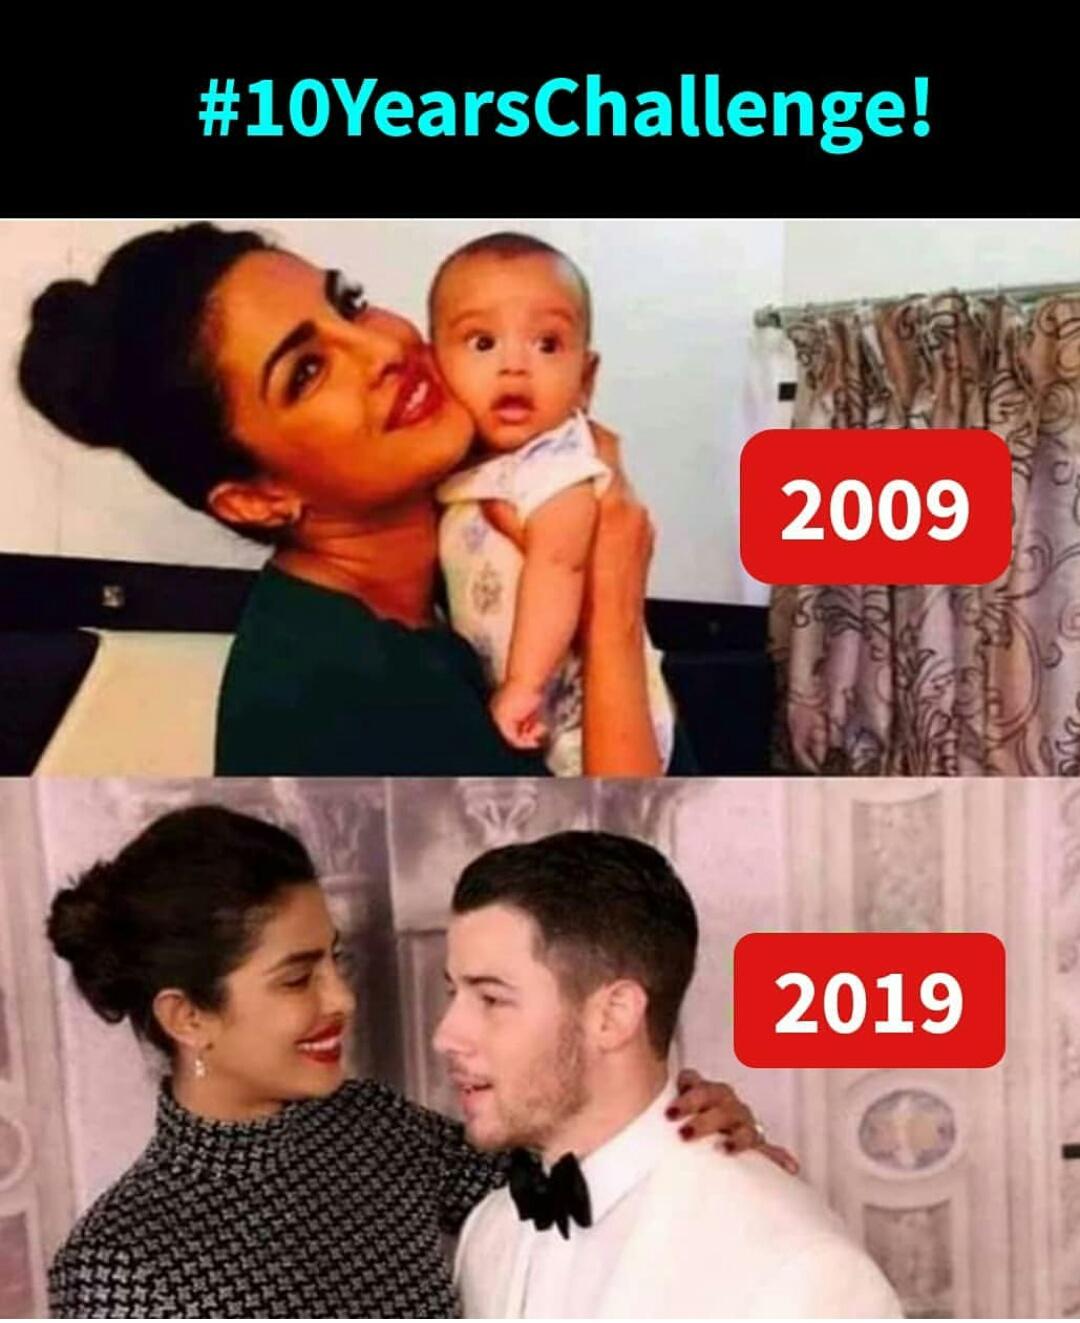 10yearschallenge Memes In Hindi